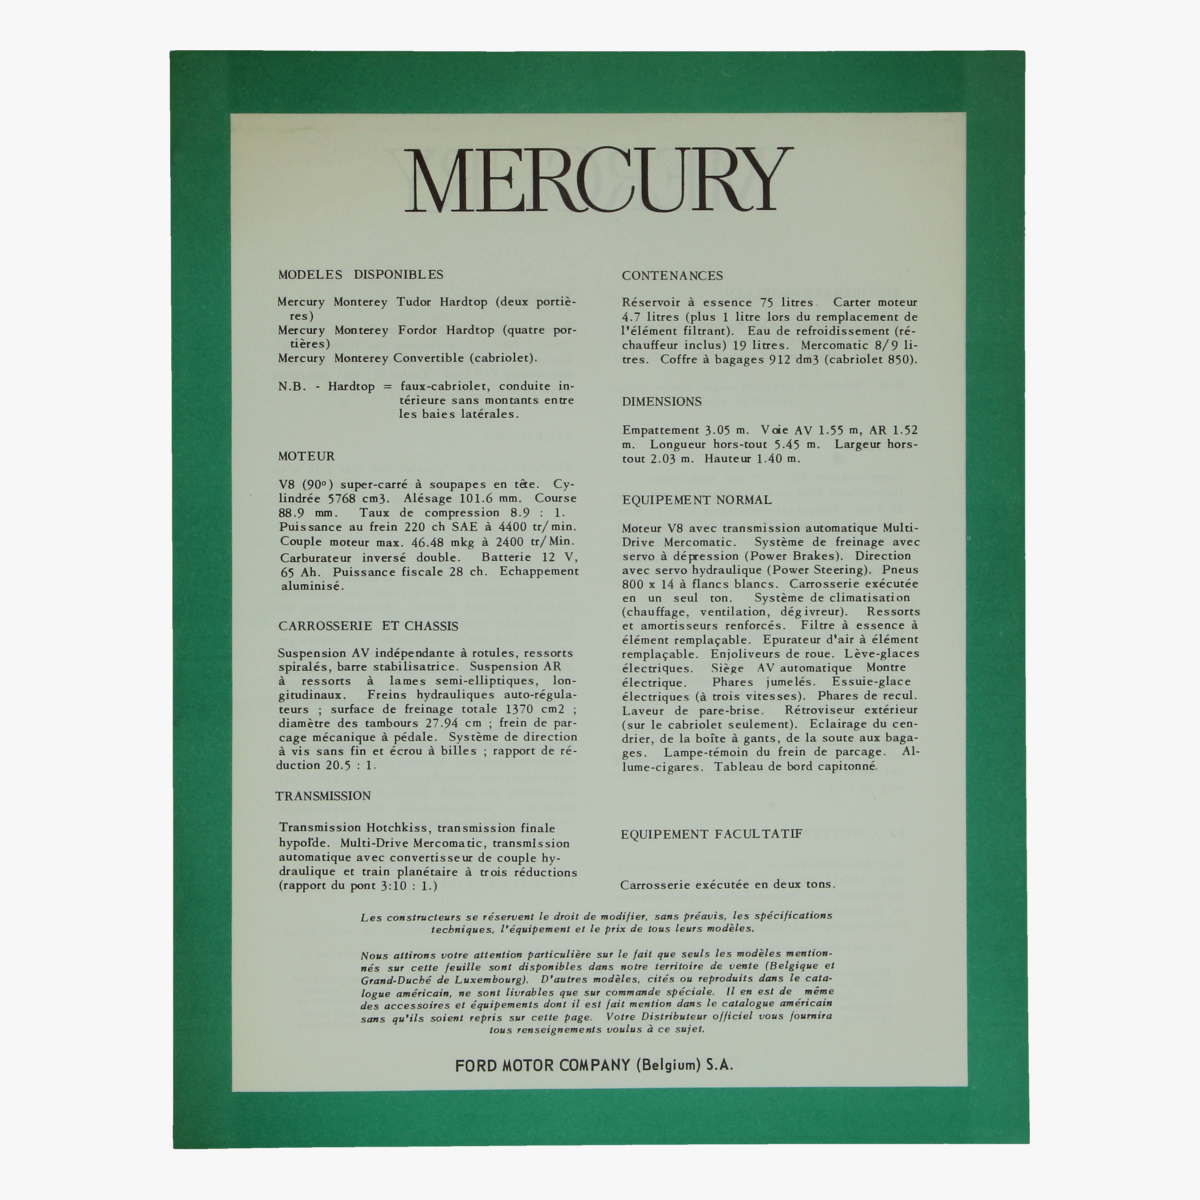 Afbeeldingen van oude folder mercury ford motor company